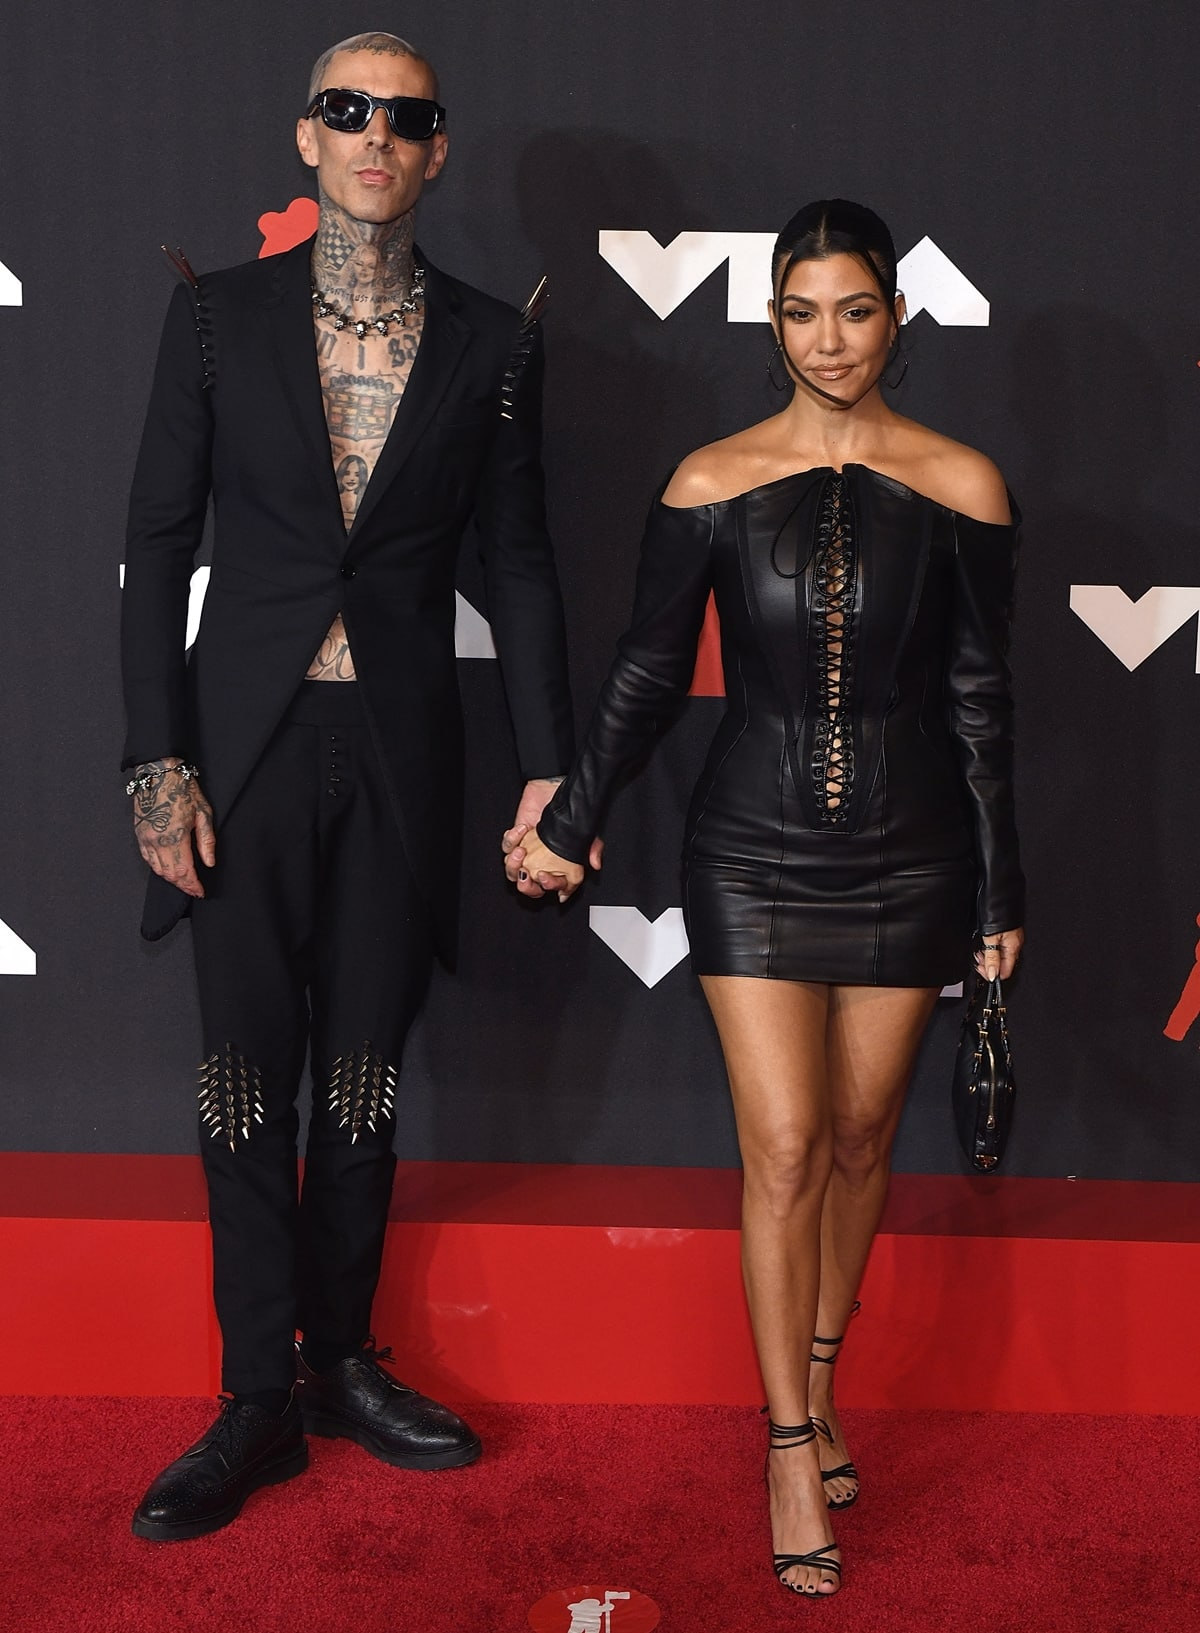 Kourtney Kardashian and Travis Barker walk the red carpet at the 2021 MTV Video Music Awards